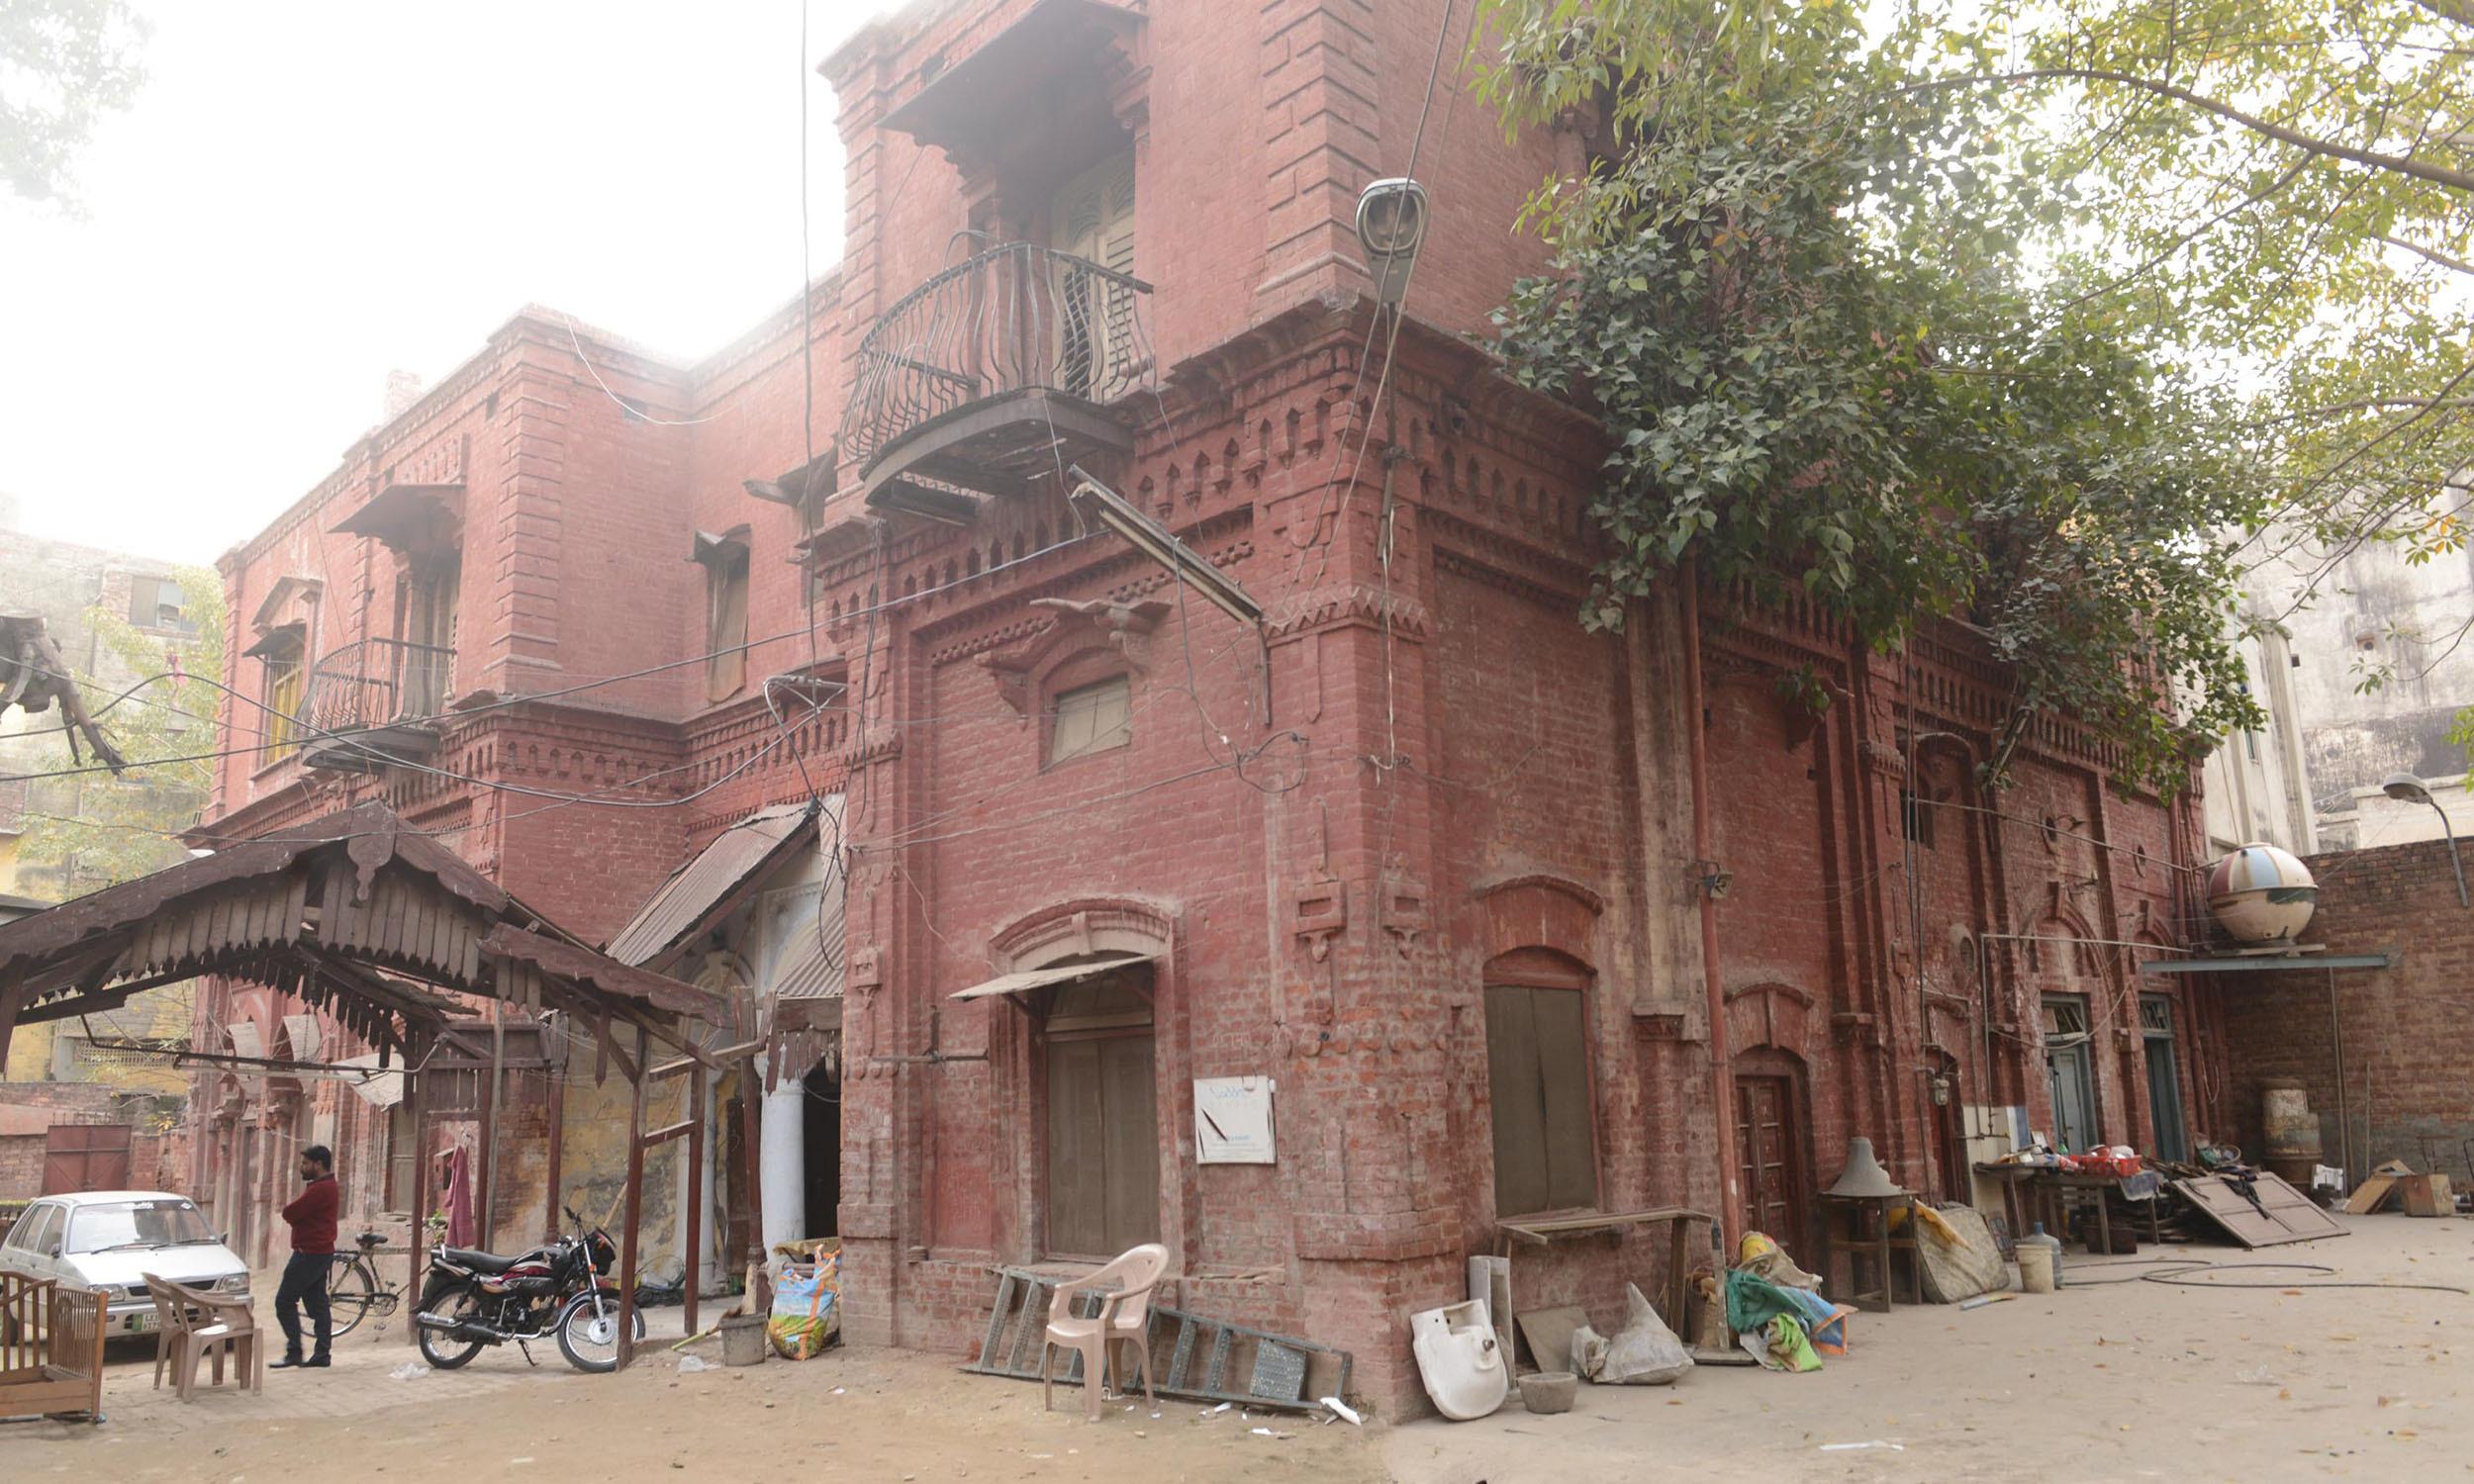 Imambargah torn down in Lahore | Azhar Jafferi, White Star